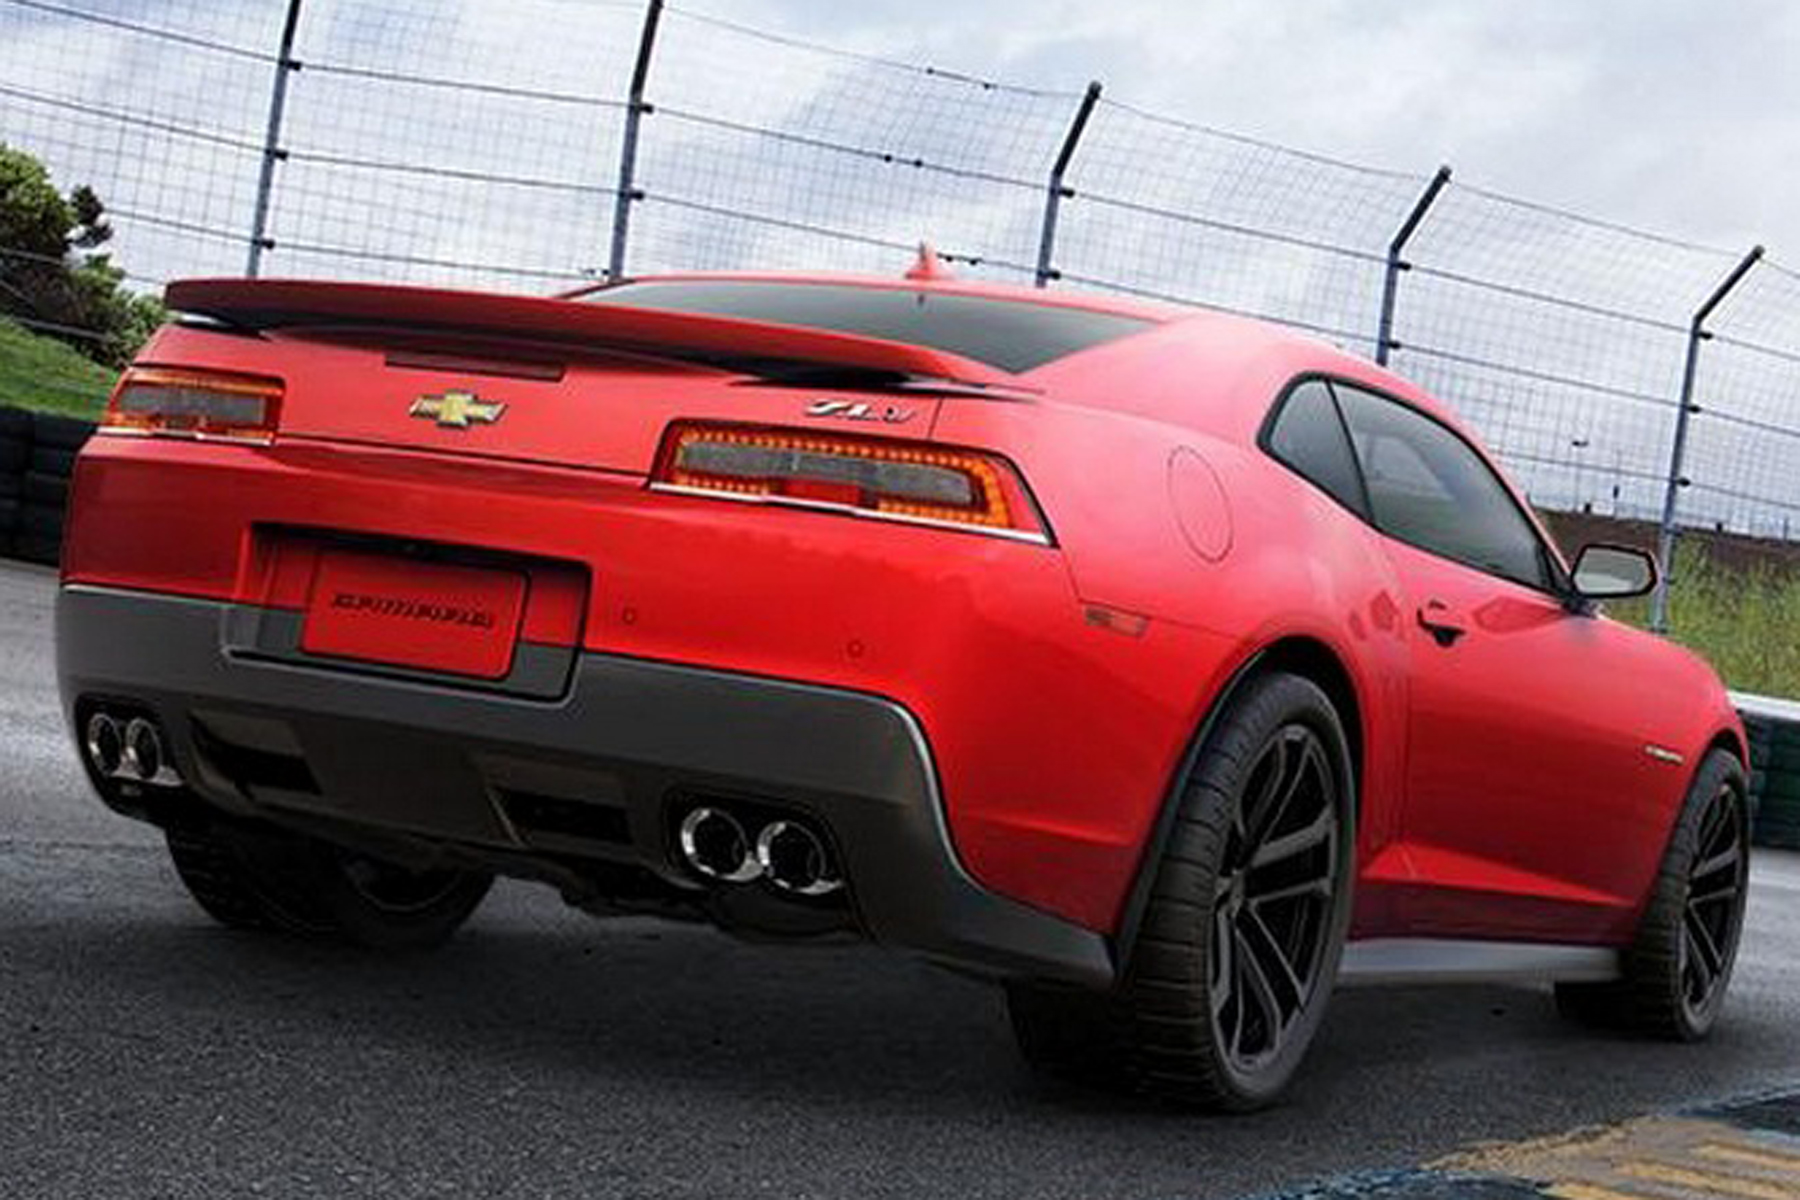 Chevrolet Convertible 2015 foto - 5